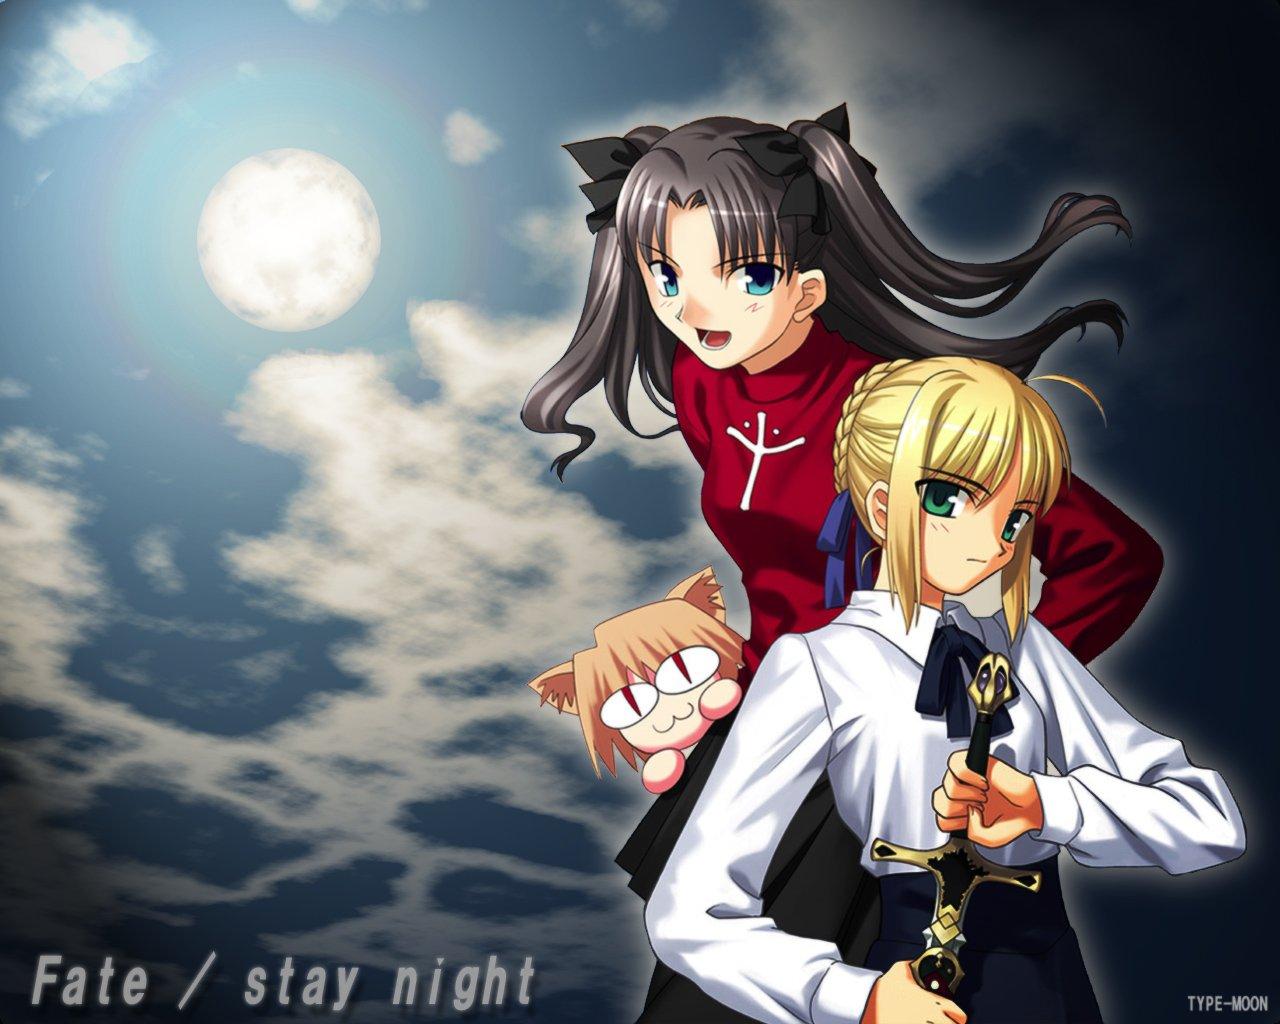 artoria_pendragon_(all) fate_(series) fate/stay_night matou_sakura saber sword weapon